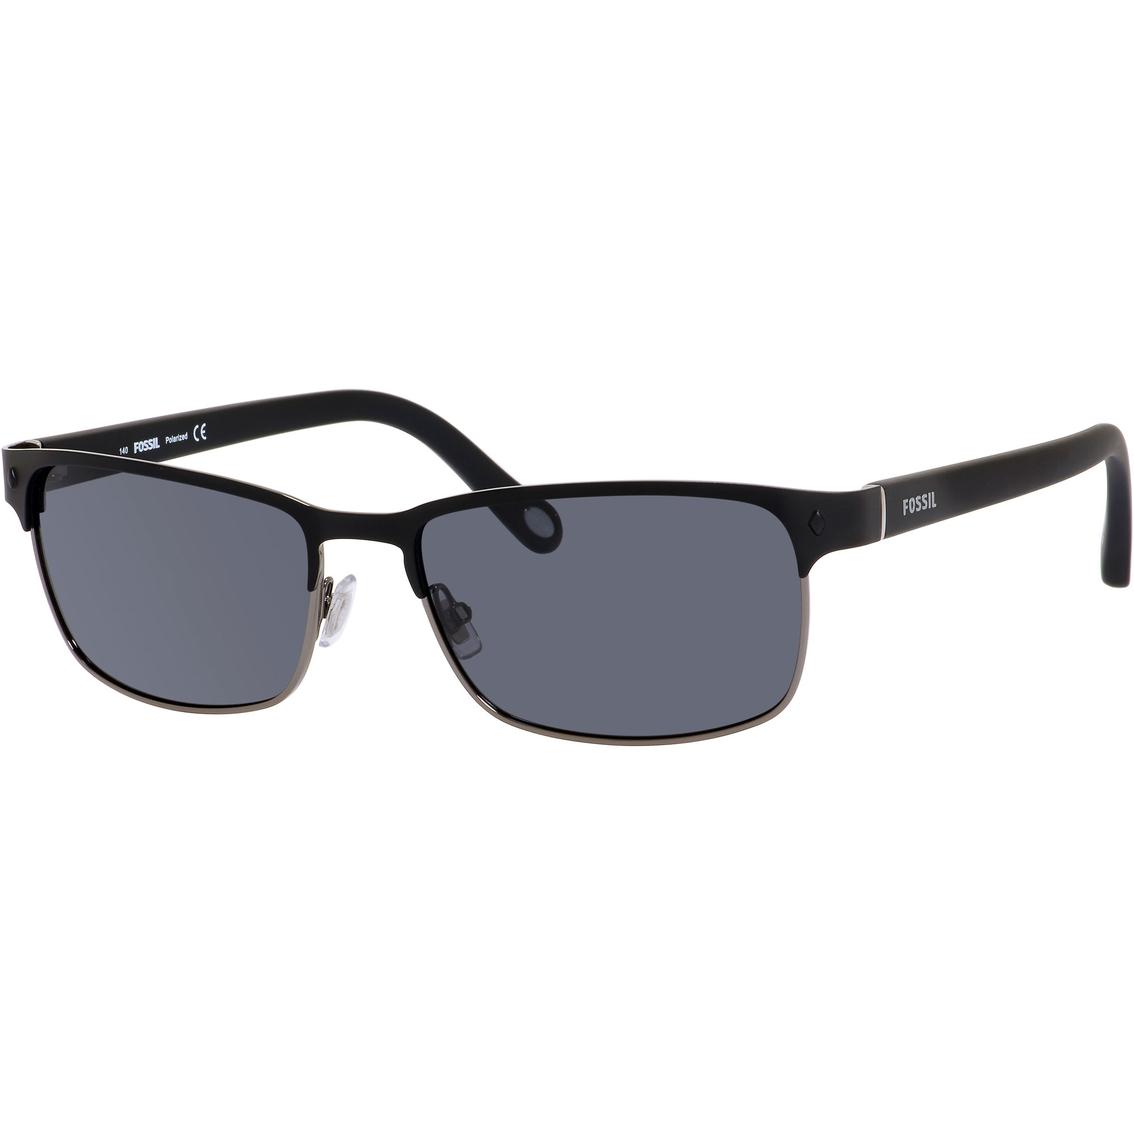 3cc8842970 Fossil Metal Rectangle Polarized Sunglasses 3000ps